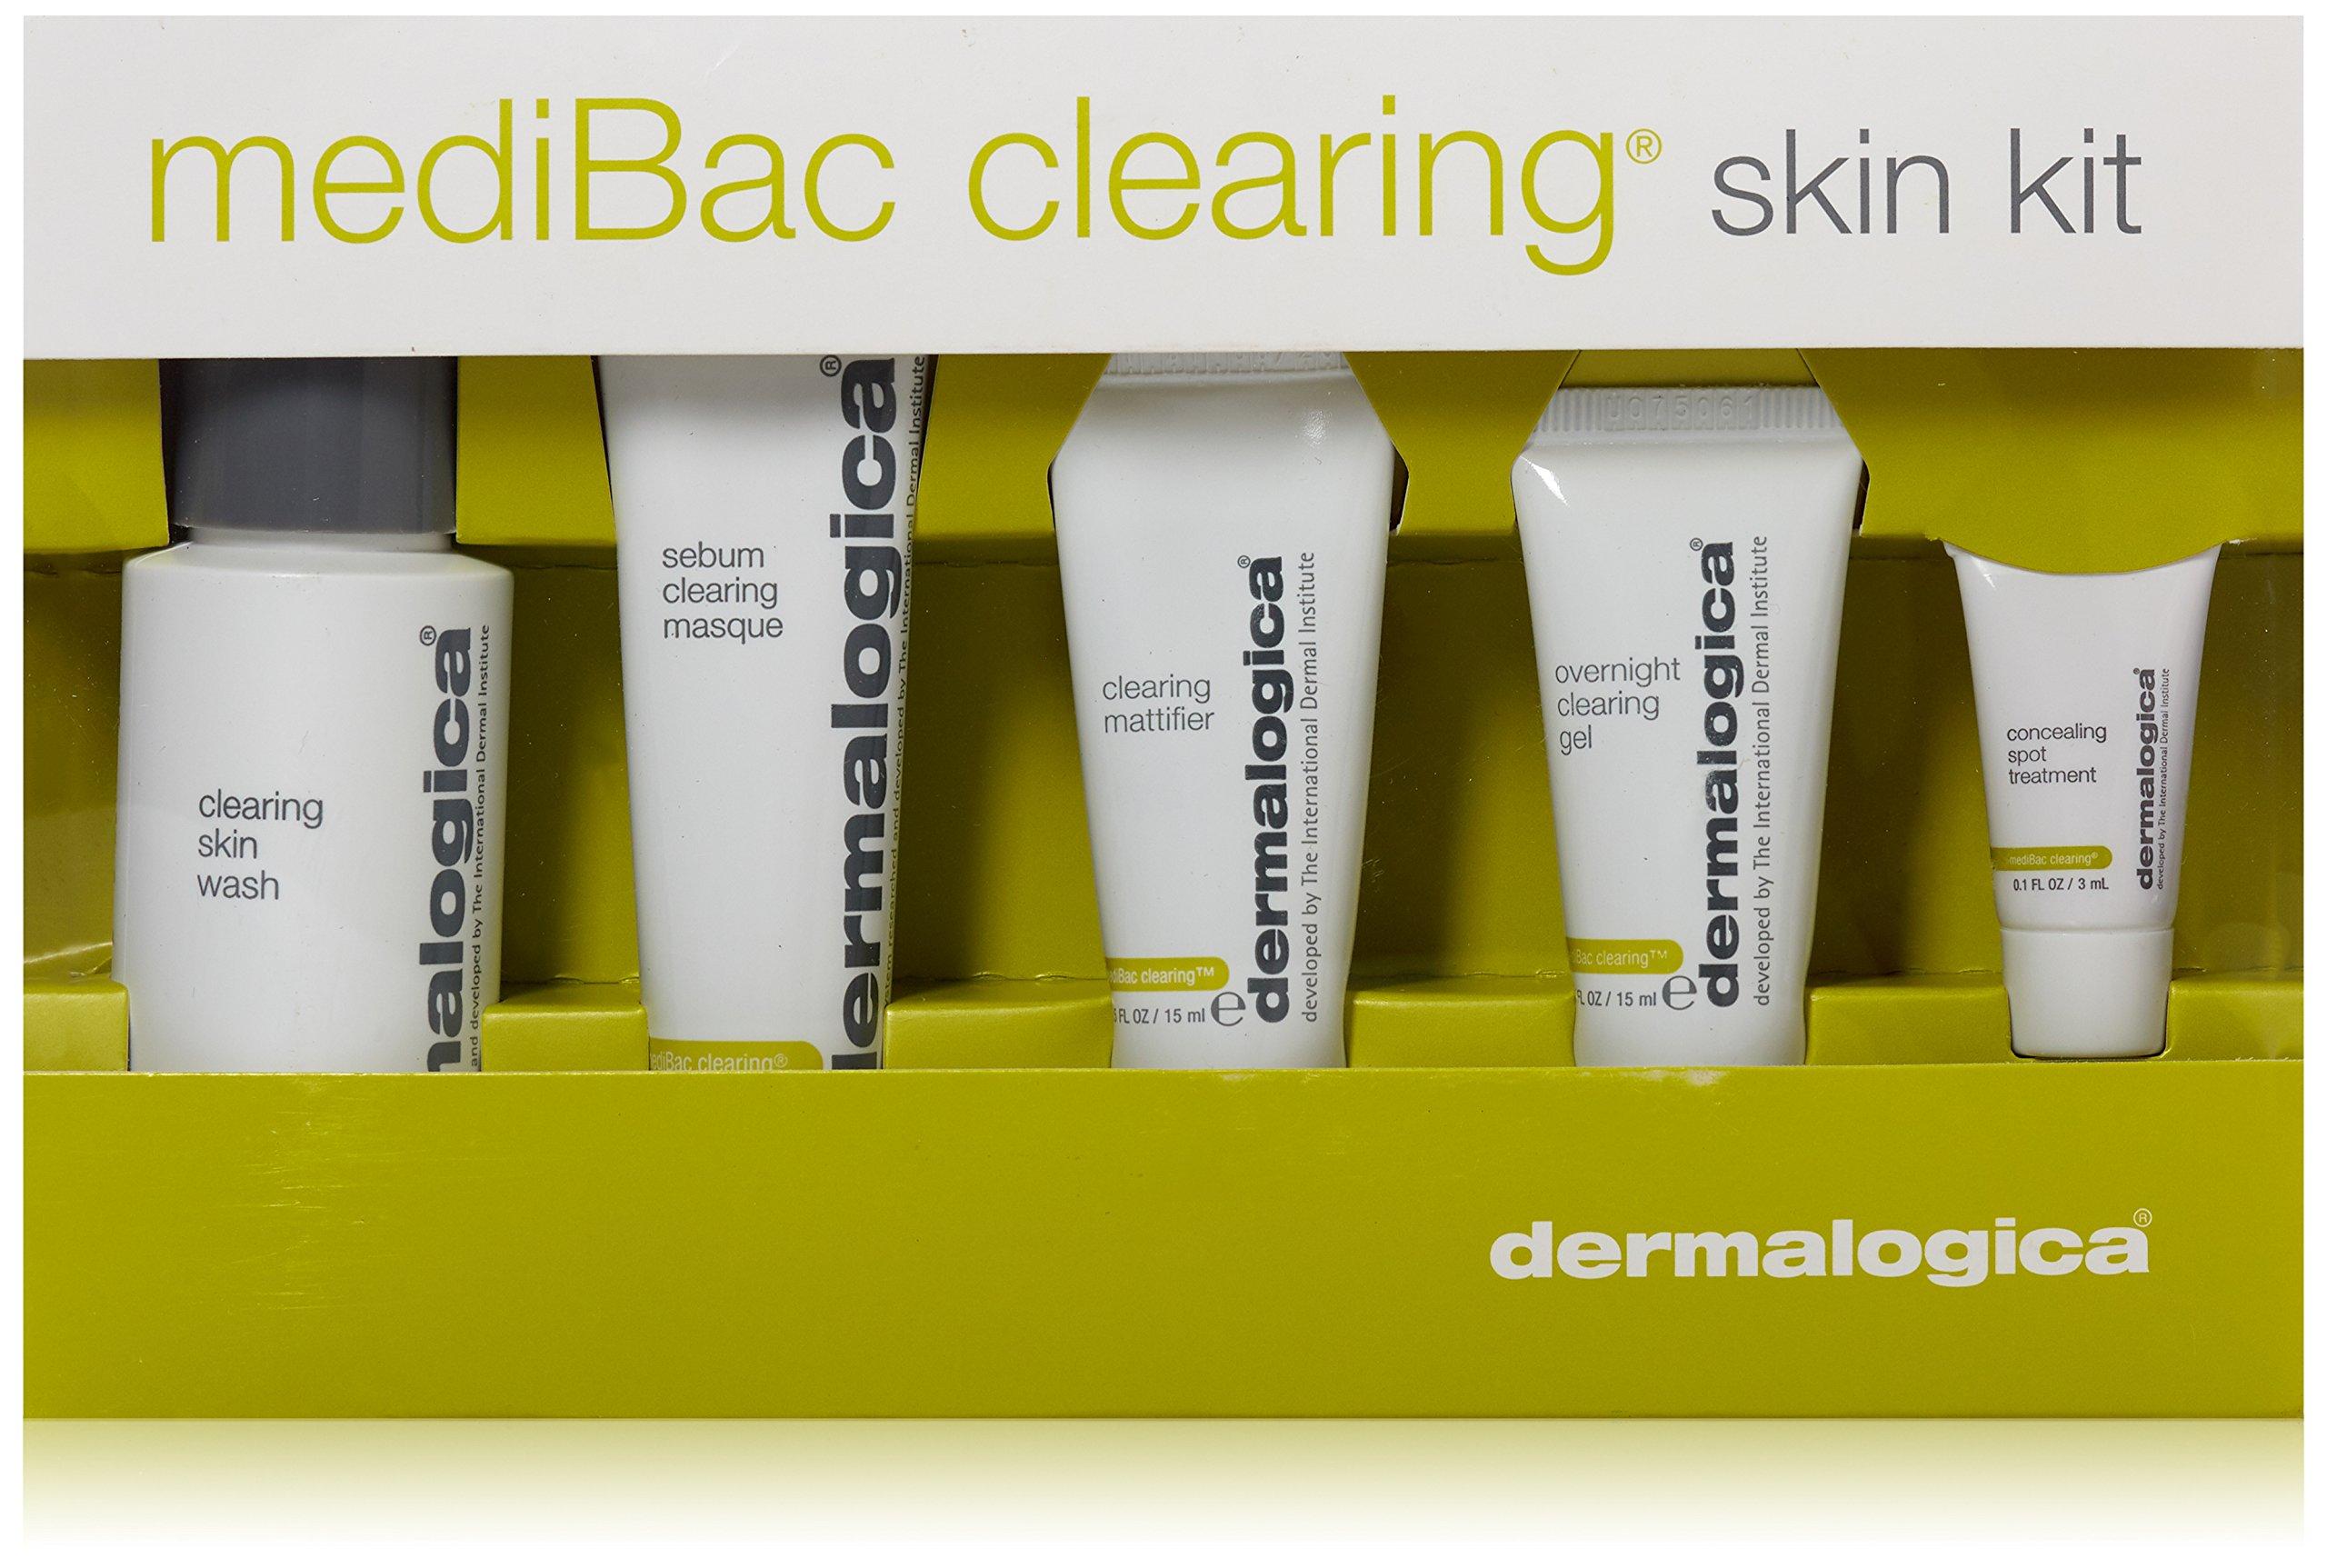 Dermalogica Medibac Clearing Skin Treatment Kit-5 Piece